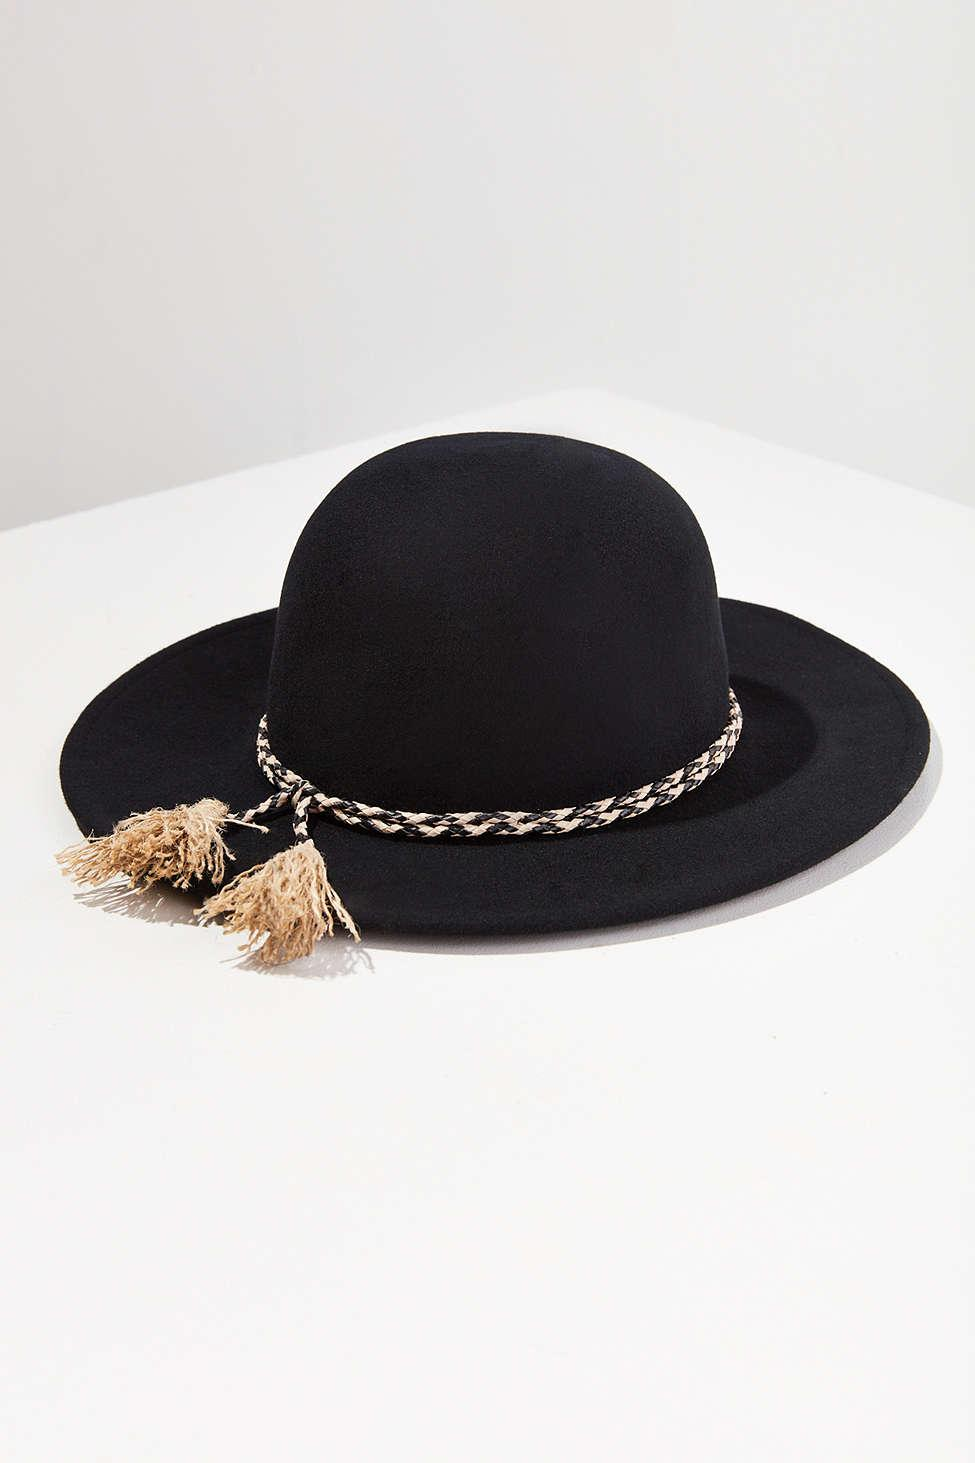 562ca74a706 ... wholesale brixton black stills hat lyst. view fullscreen f302c ee852